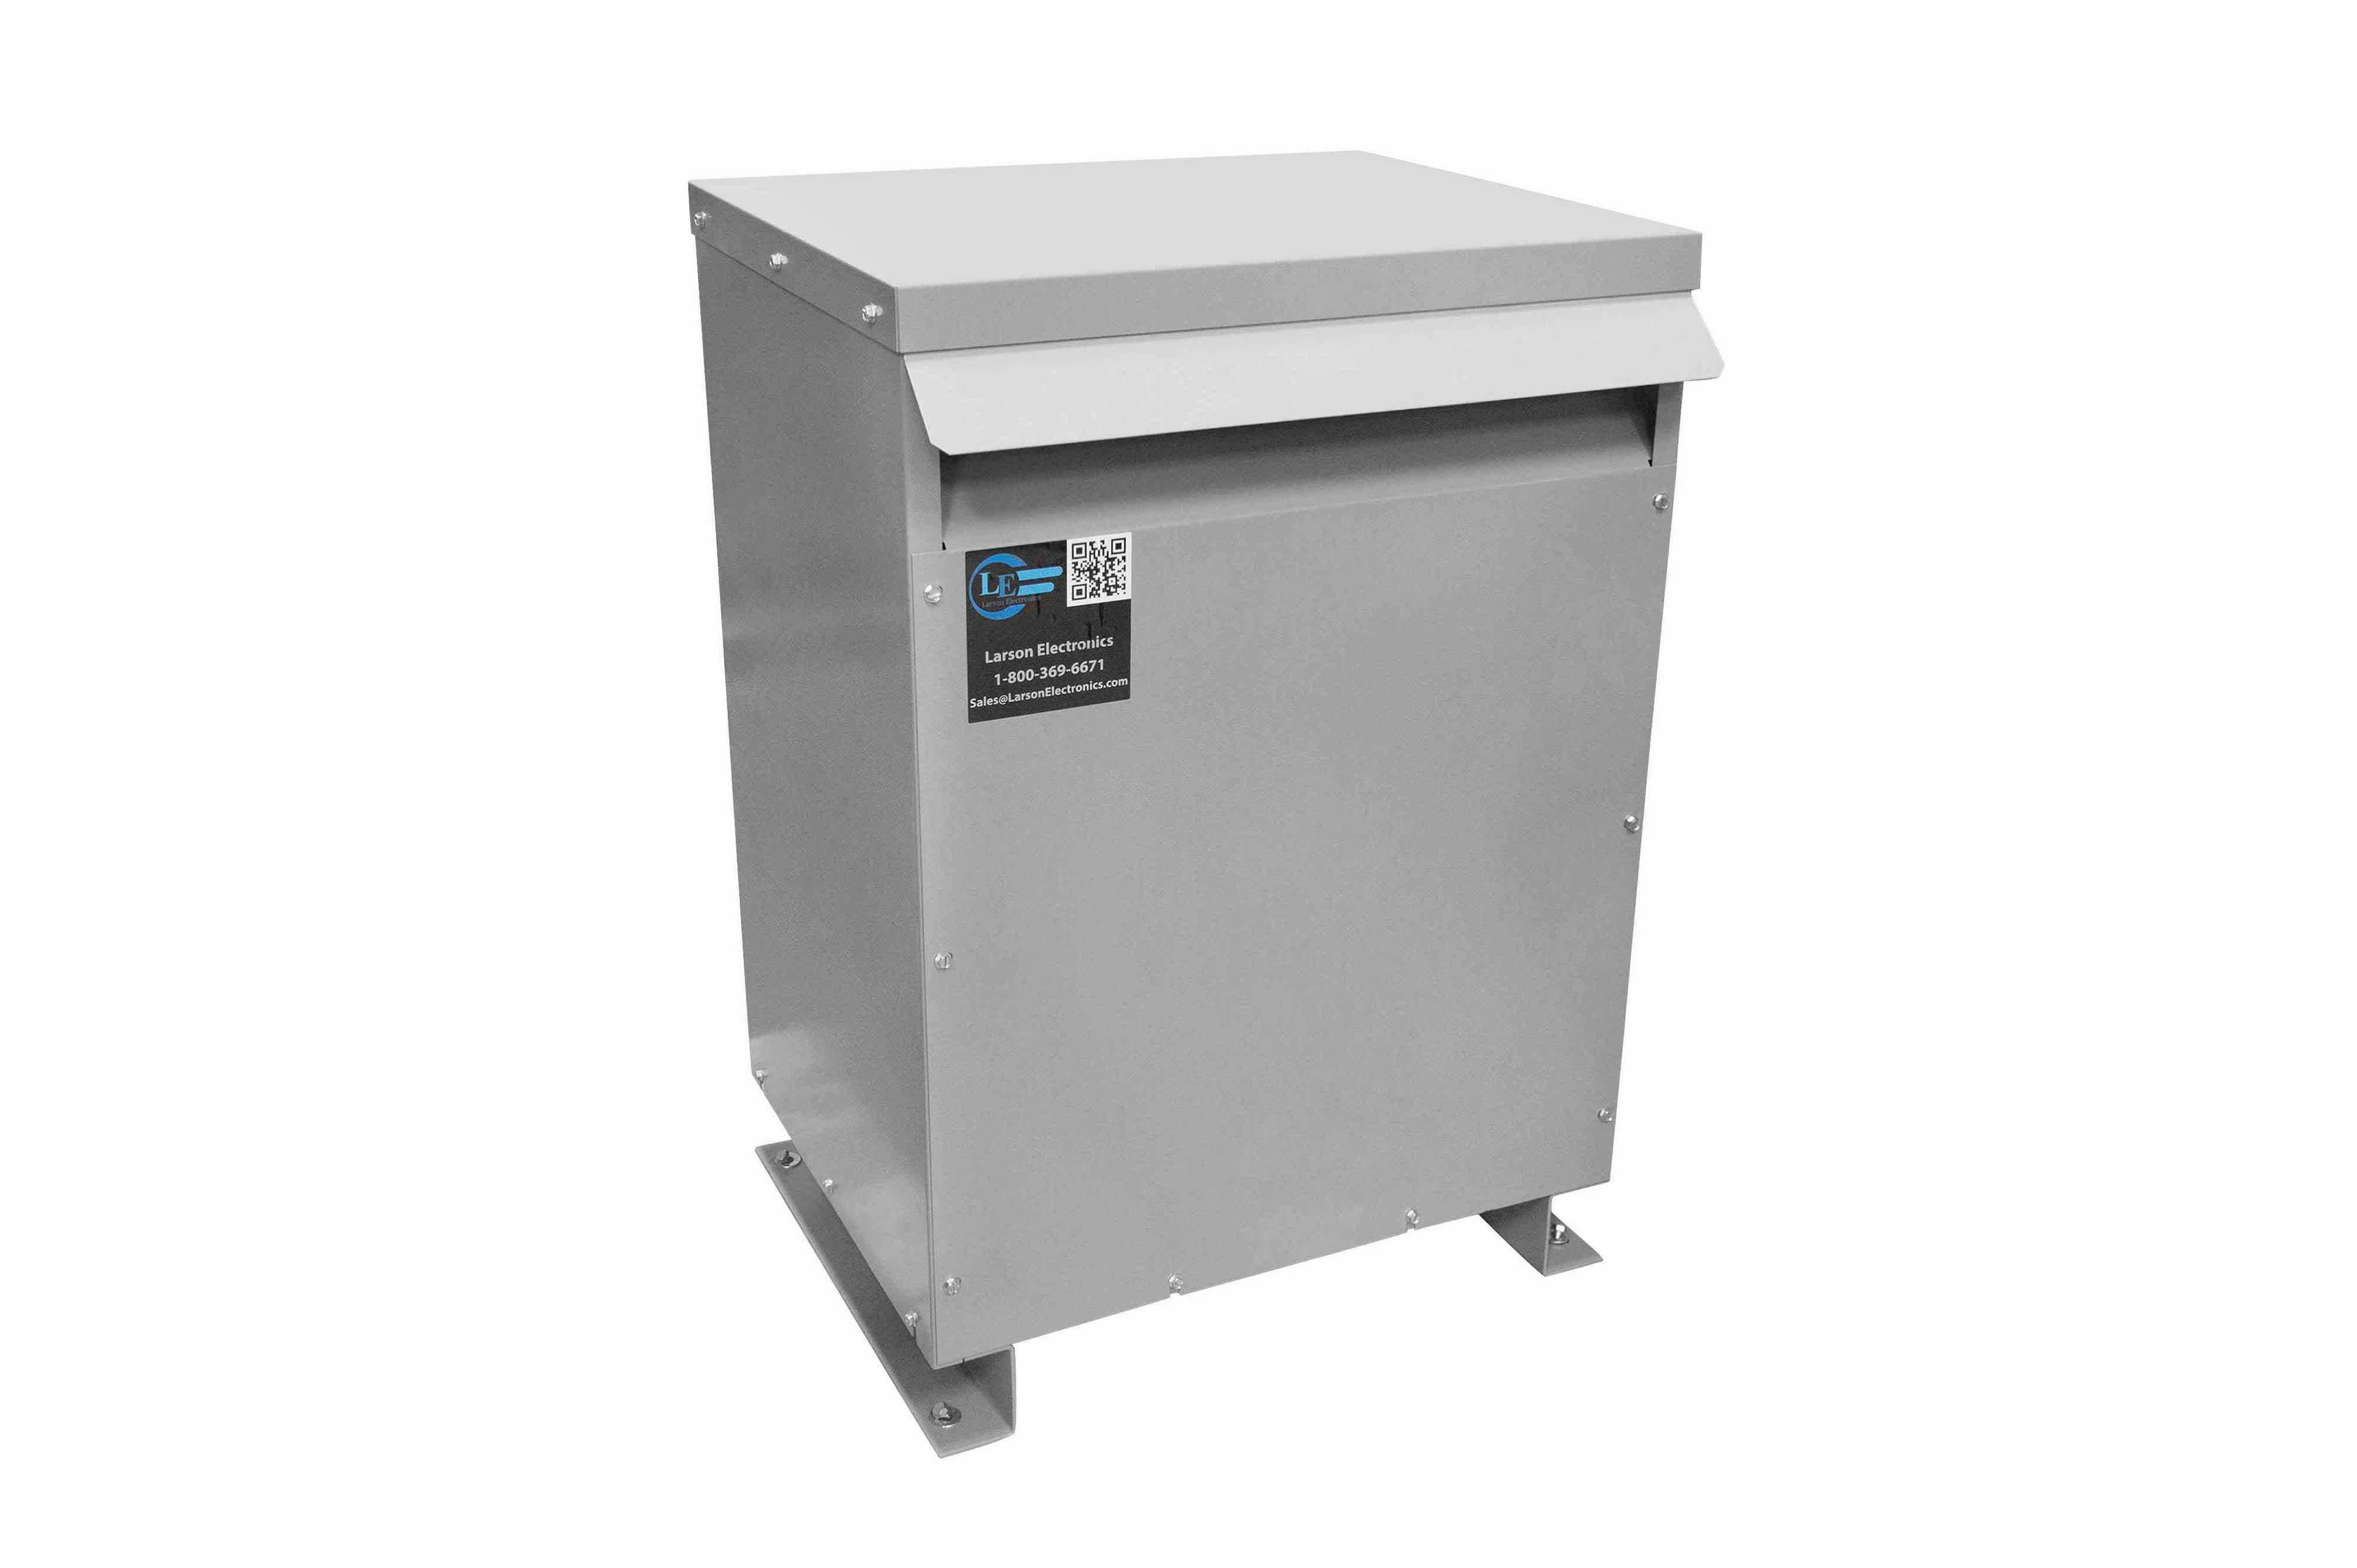 38 kVA 3PH Isolation Transformer, 230V Wye Primary, 208Y/120 Wye-N Secondary, N3R, Ventilated, 60 Hz